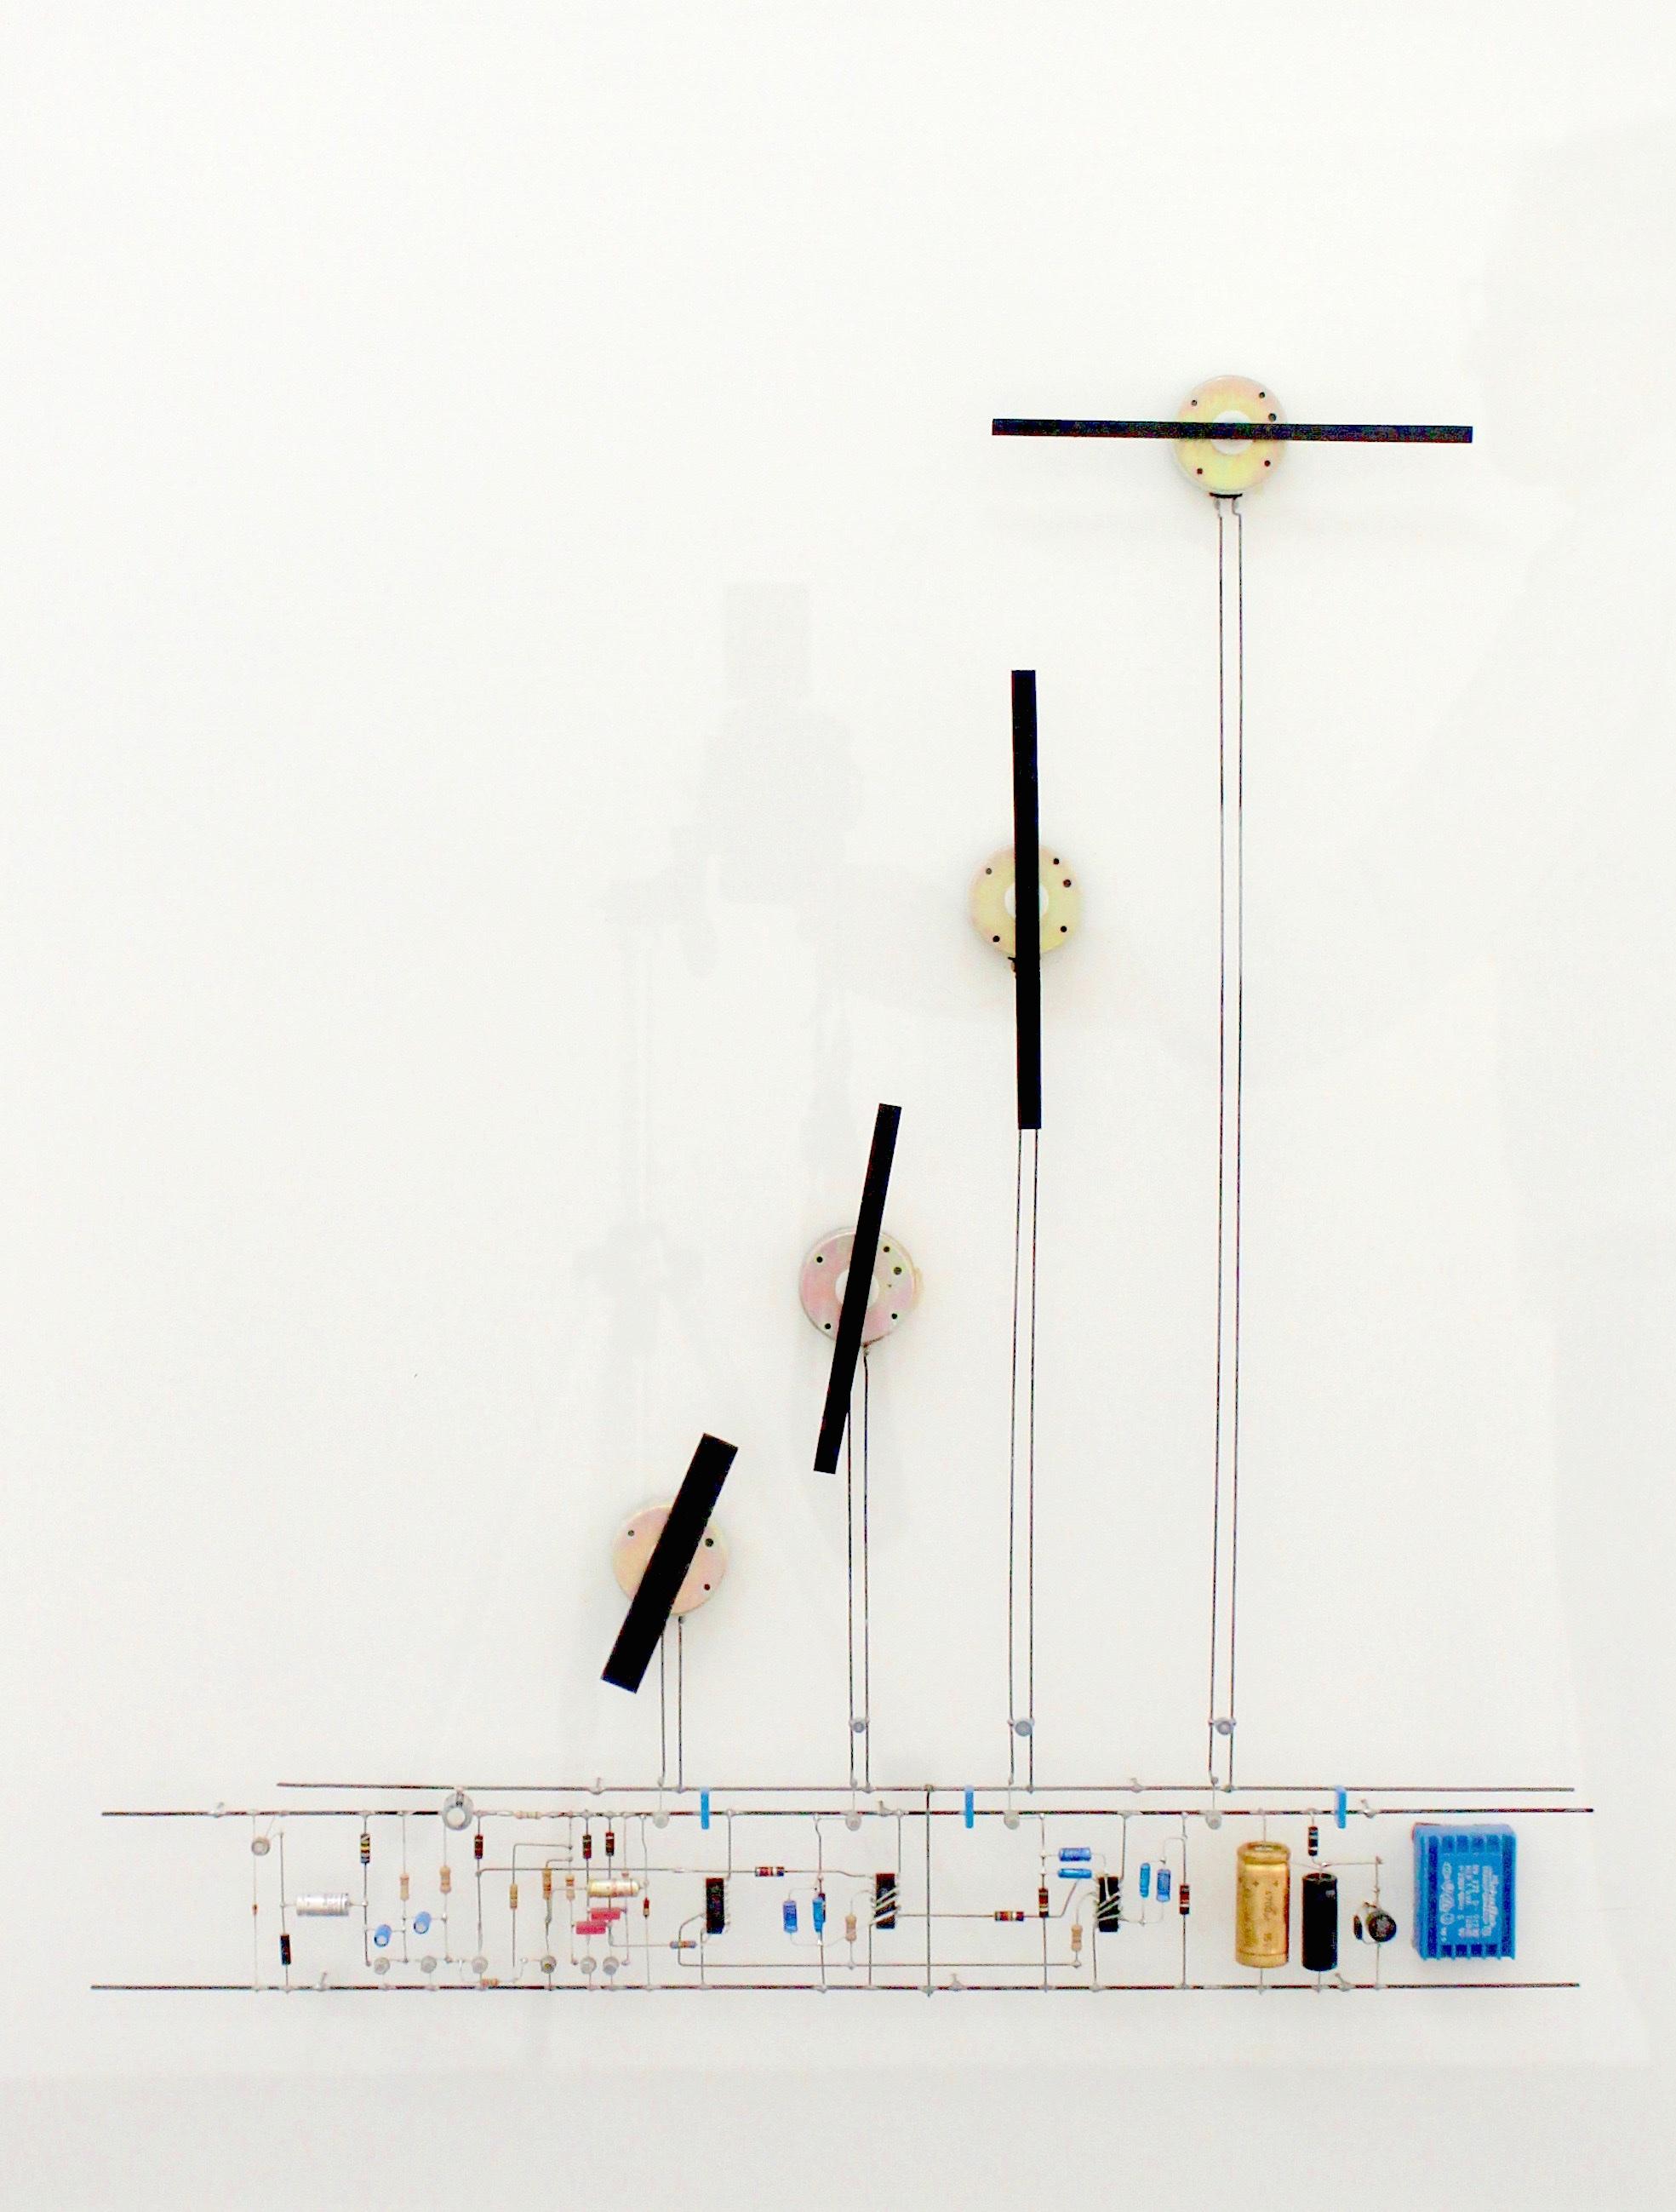 Peter Vogel, Drehflügel, mixed media (movement), 61 cm x 80,5 cm x 10,5 cm, 1998